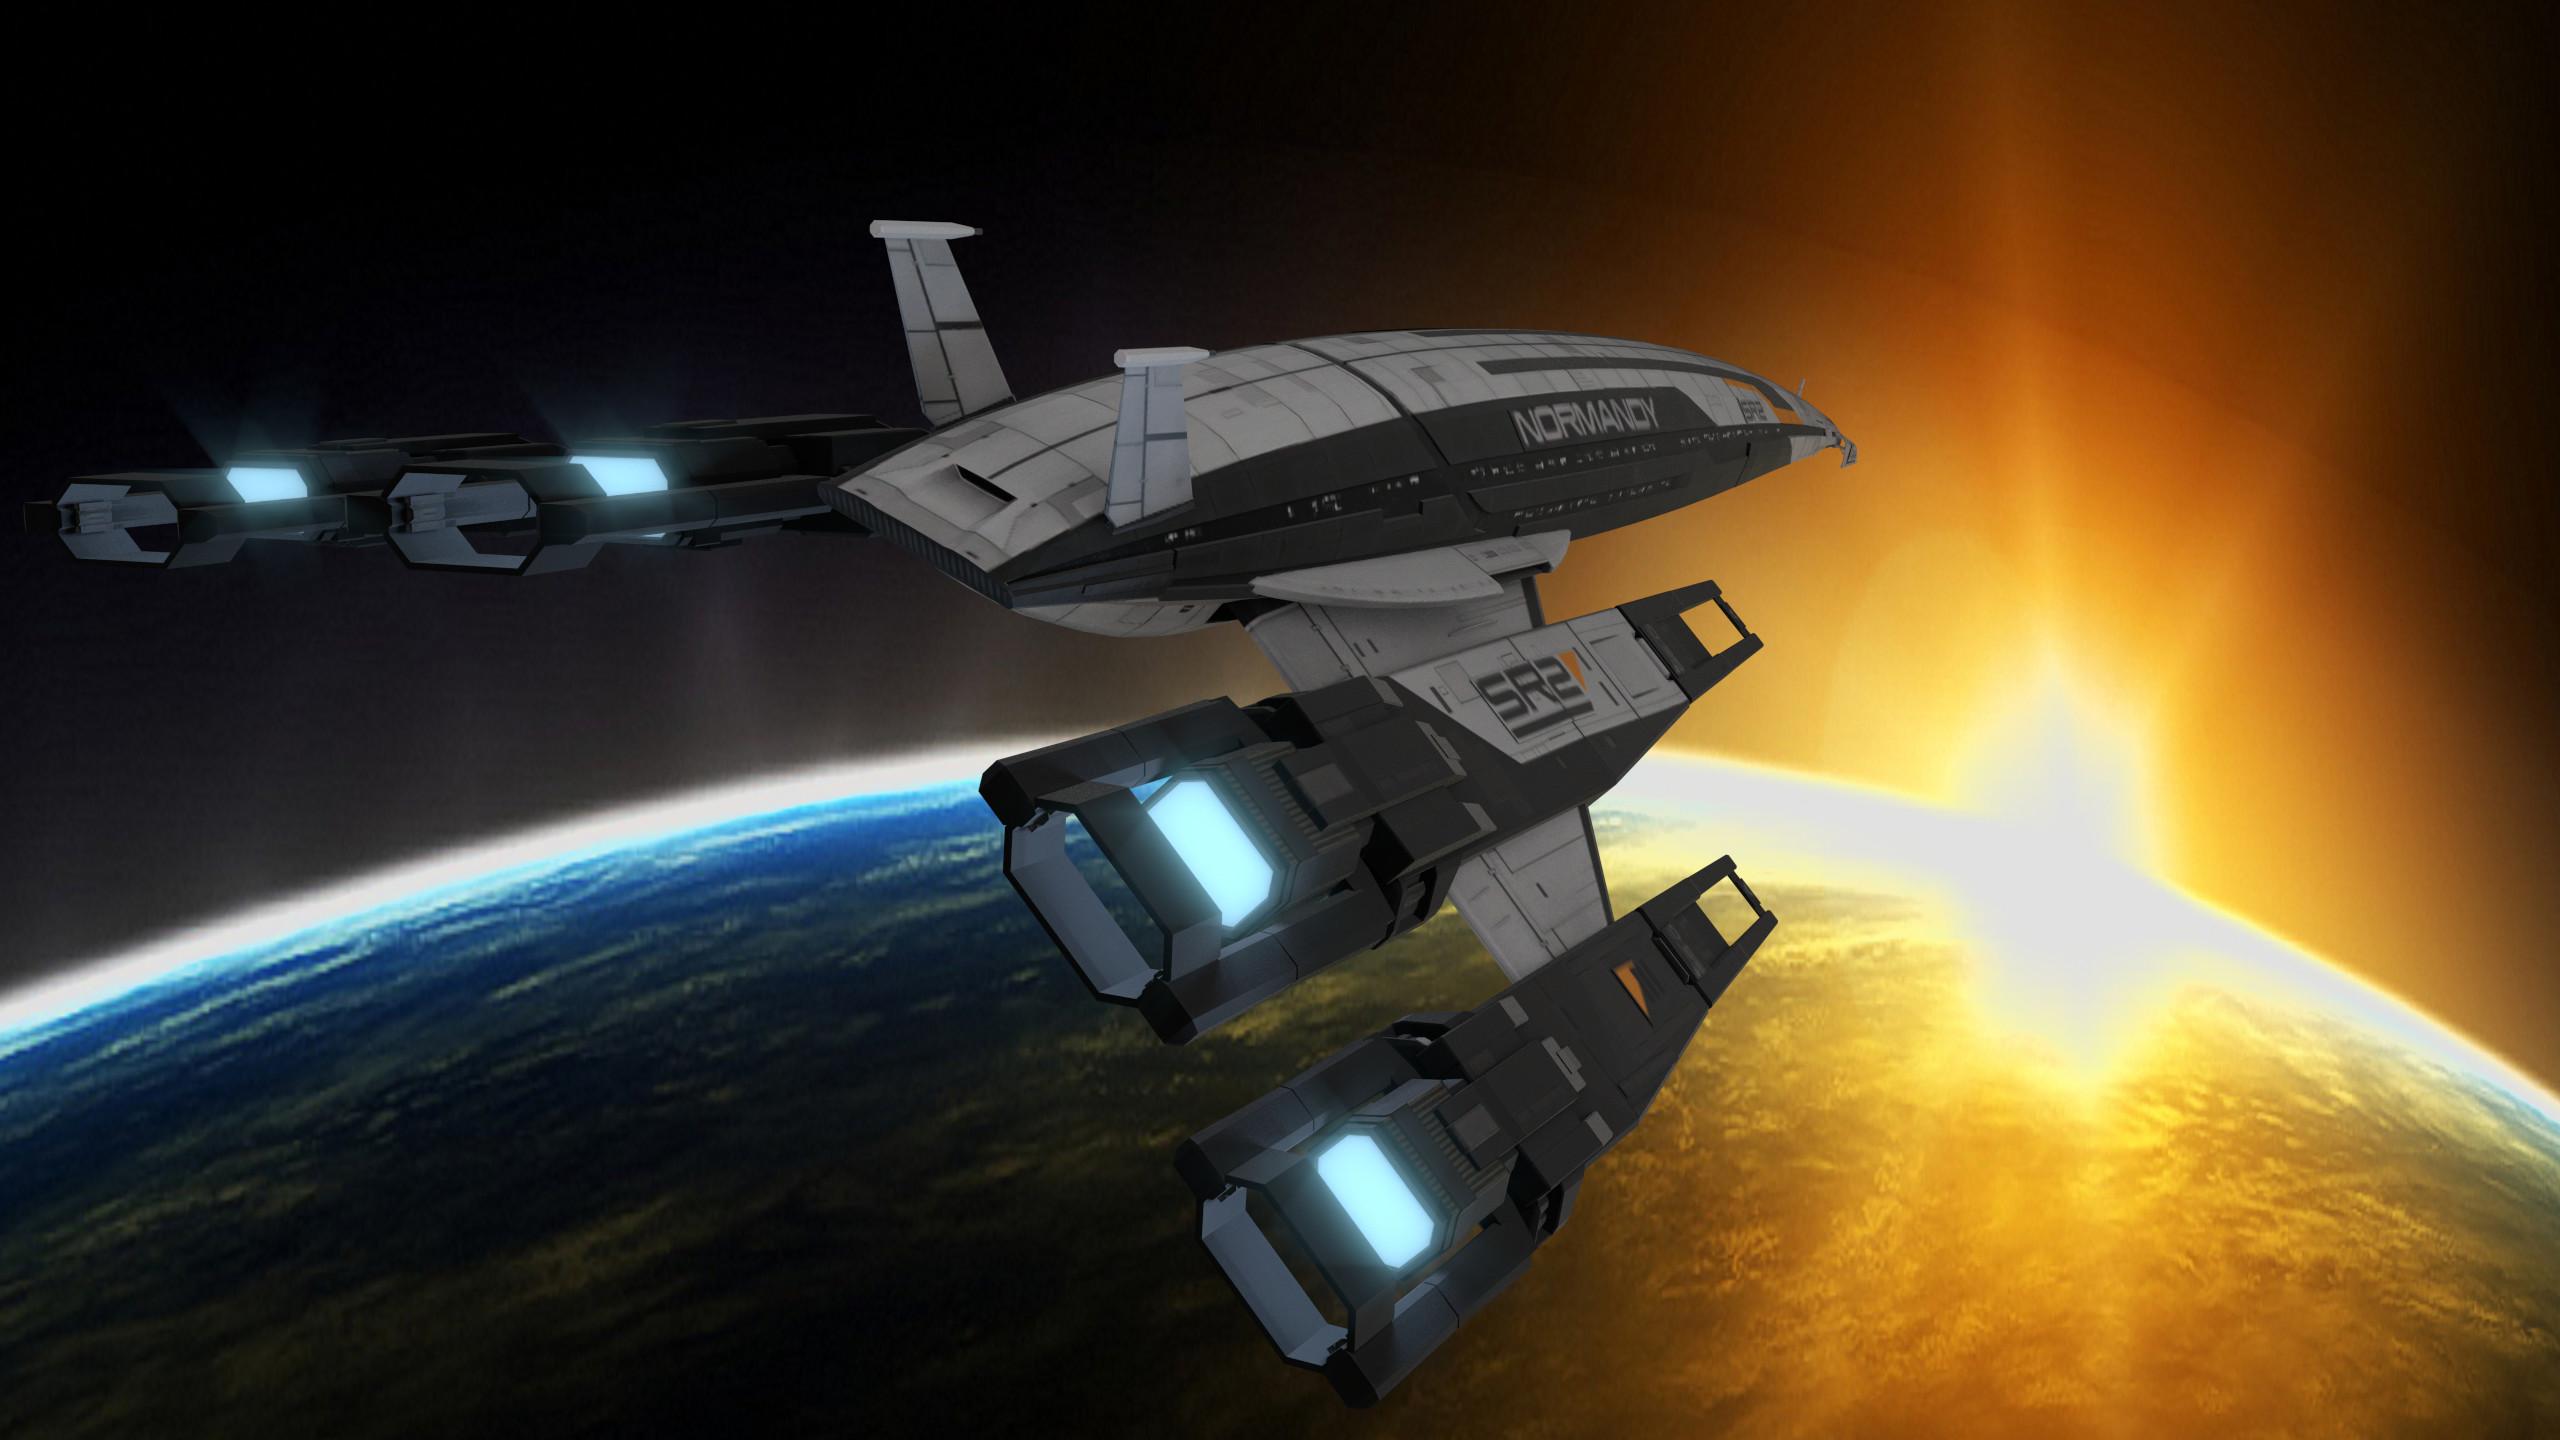 Ssv Normandy Sr 2 18 Ship Replica: SSV Normandy SR-2 (Mass Effect 2, Fanart By Stanislaw